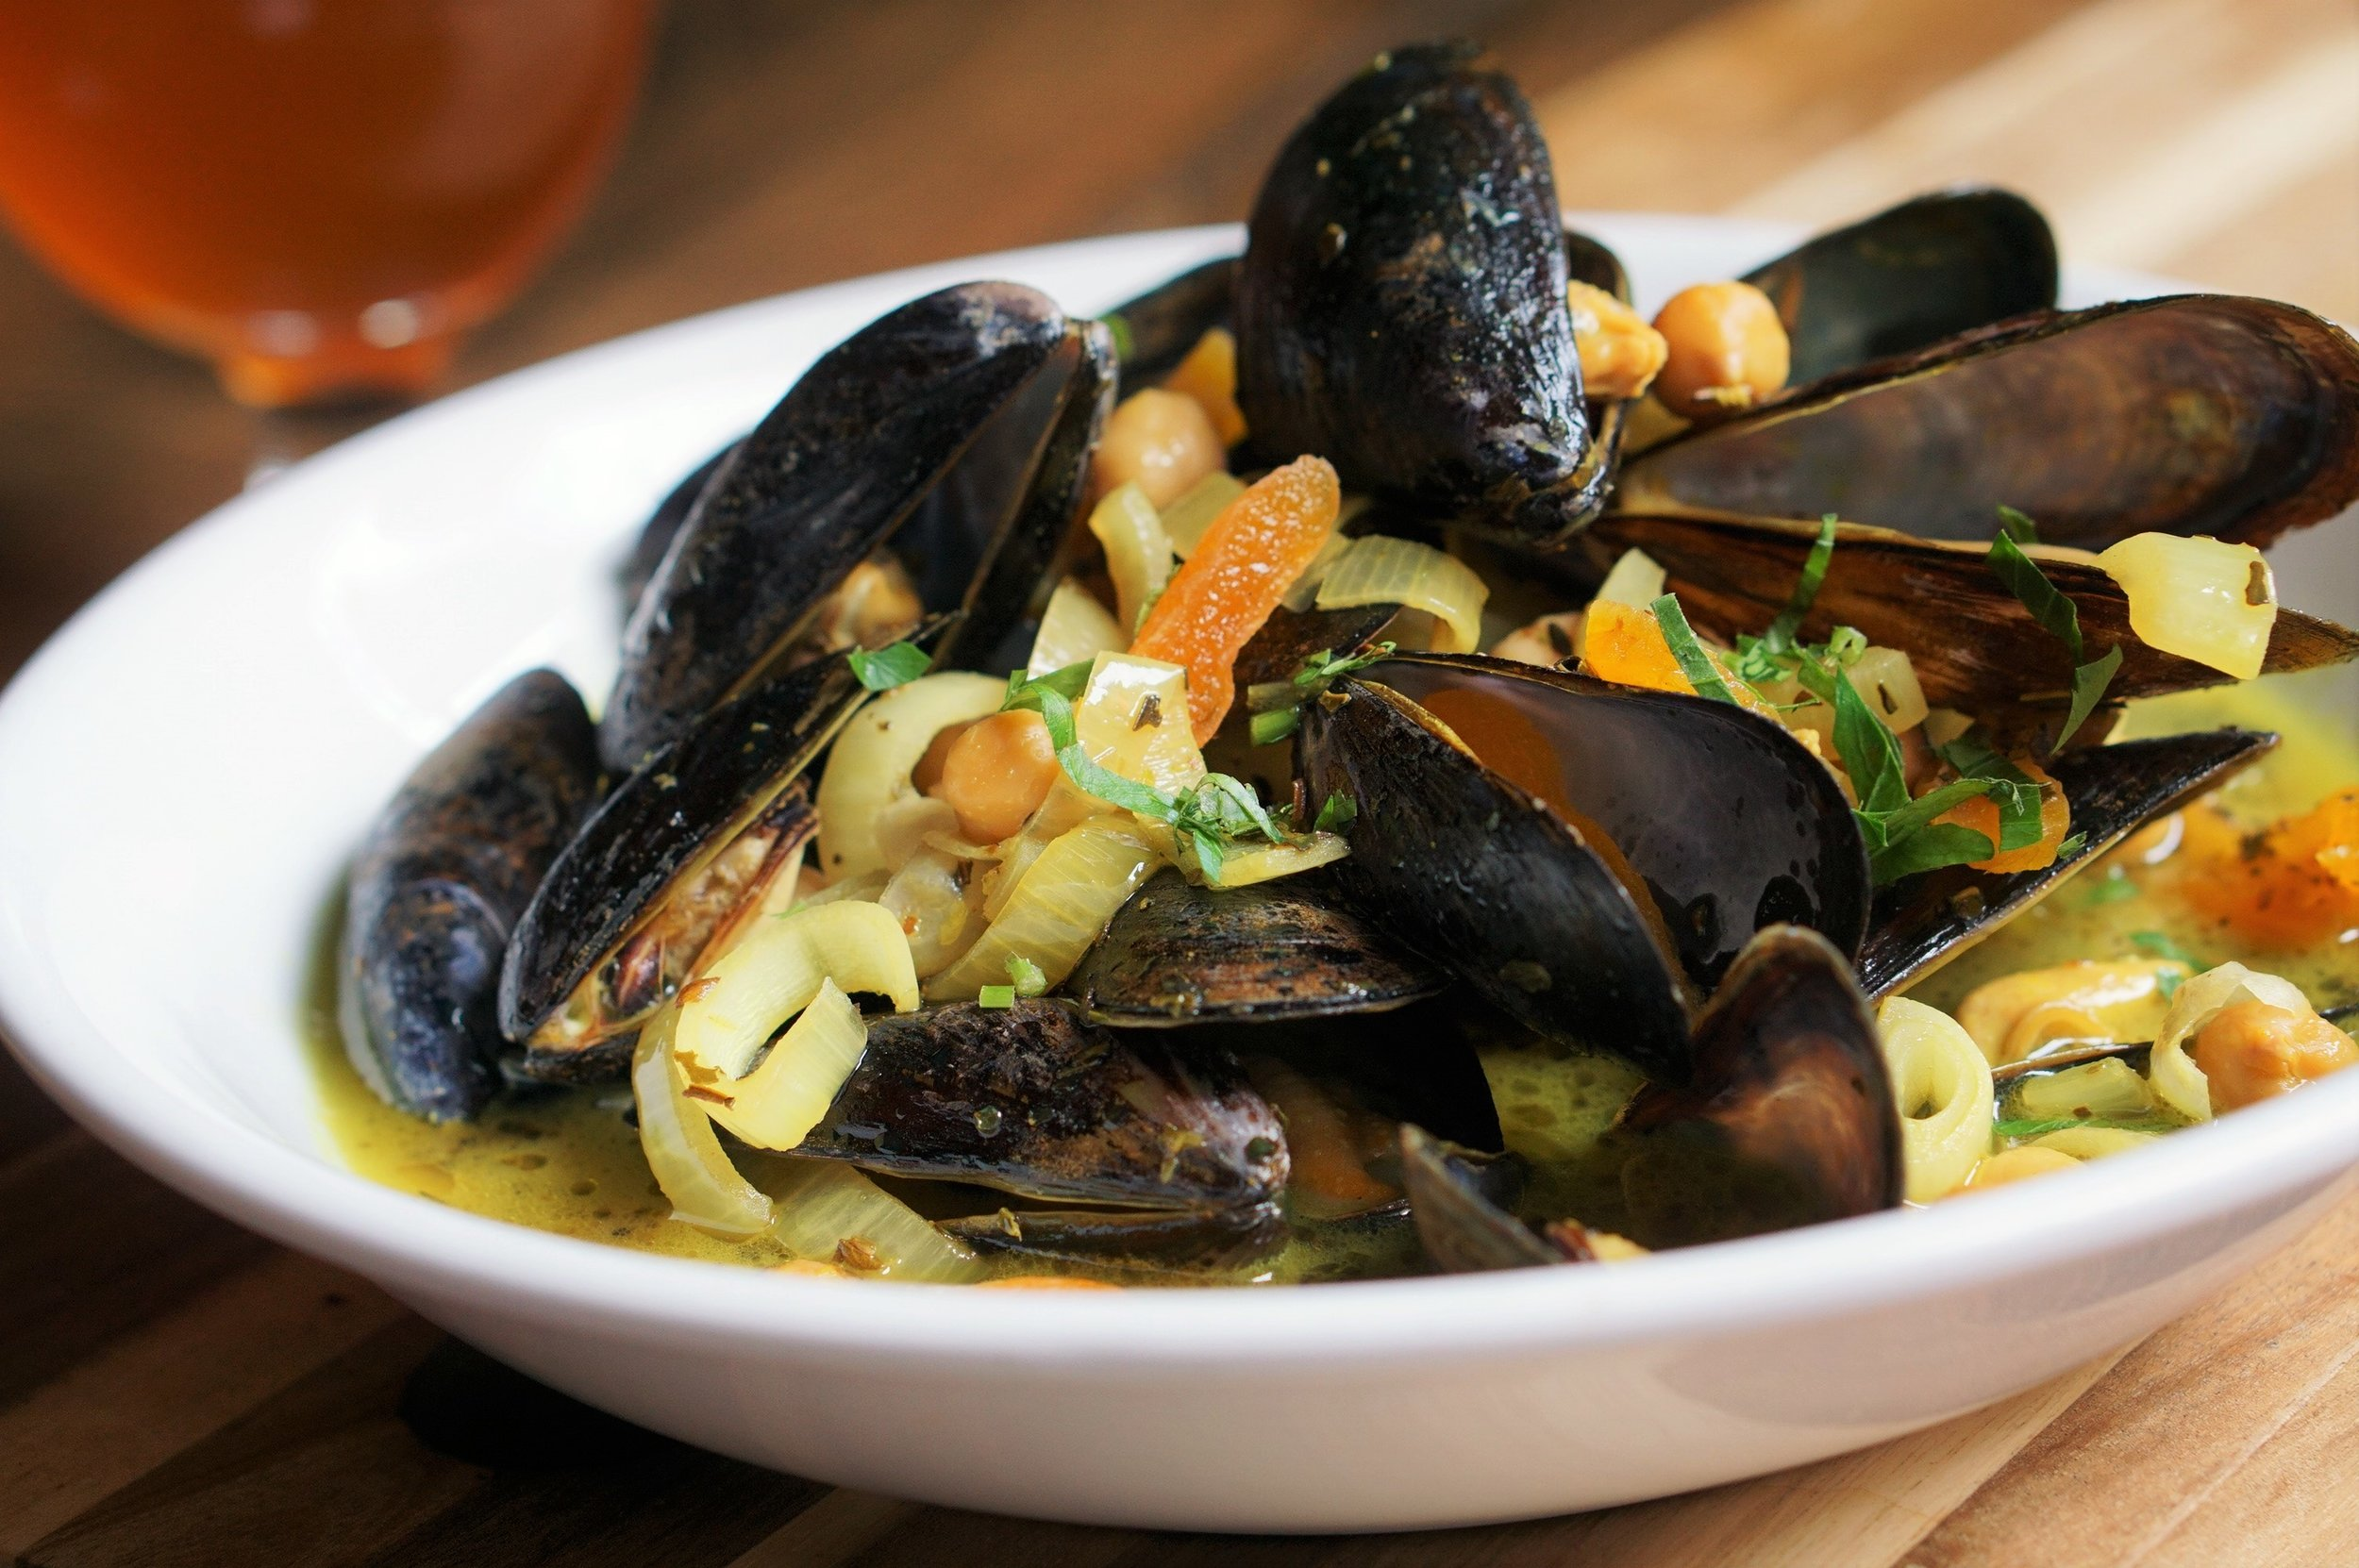 Cinder, Jonathan Petruce, Philadelphia, Restaurant, Uptown Beer Garden, Pizza, Mussels, Cider, small plates